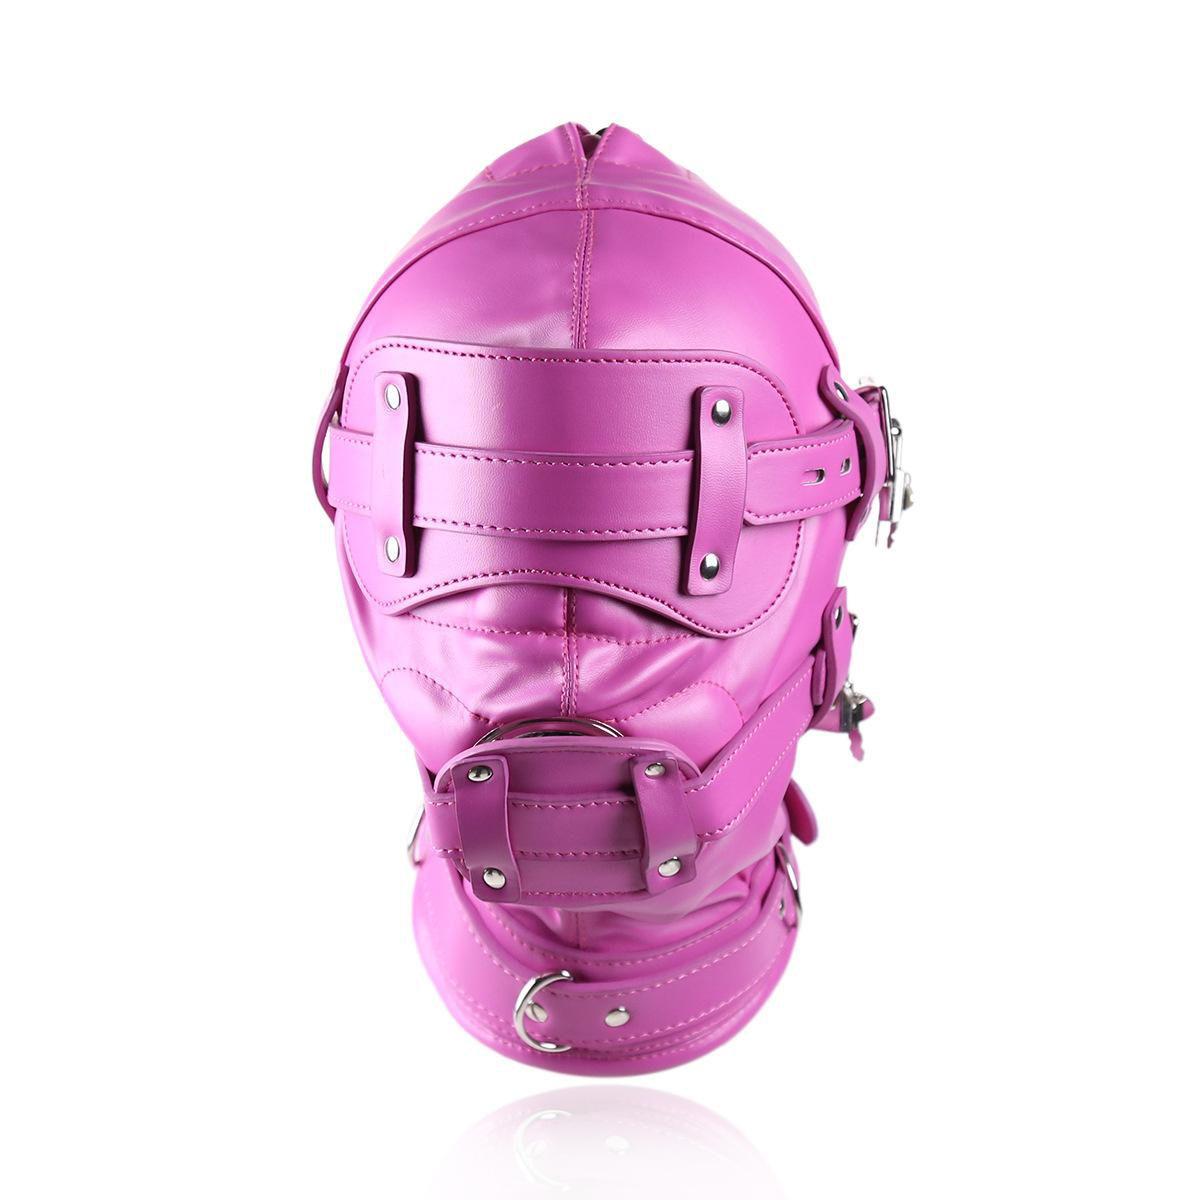 2020 Erotic Sex BDSM Bondage Leather Hood for Adult Play Games Full Masks Fetish Face Blindfold for Couple Games Q123